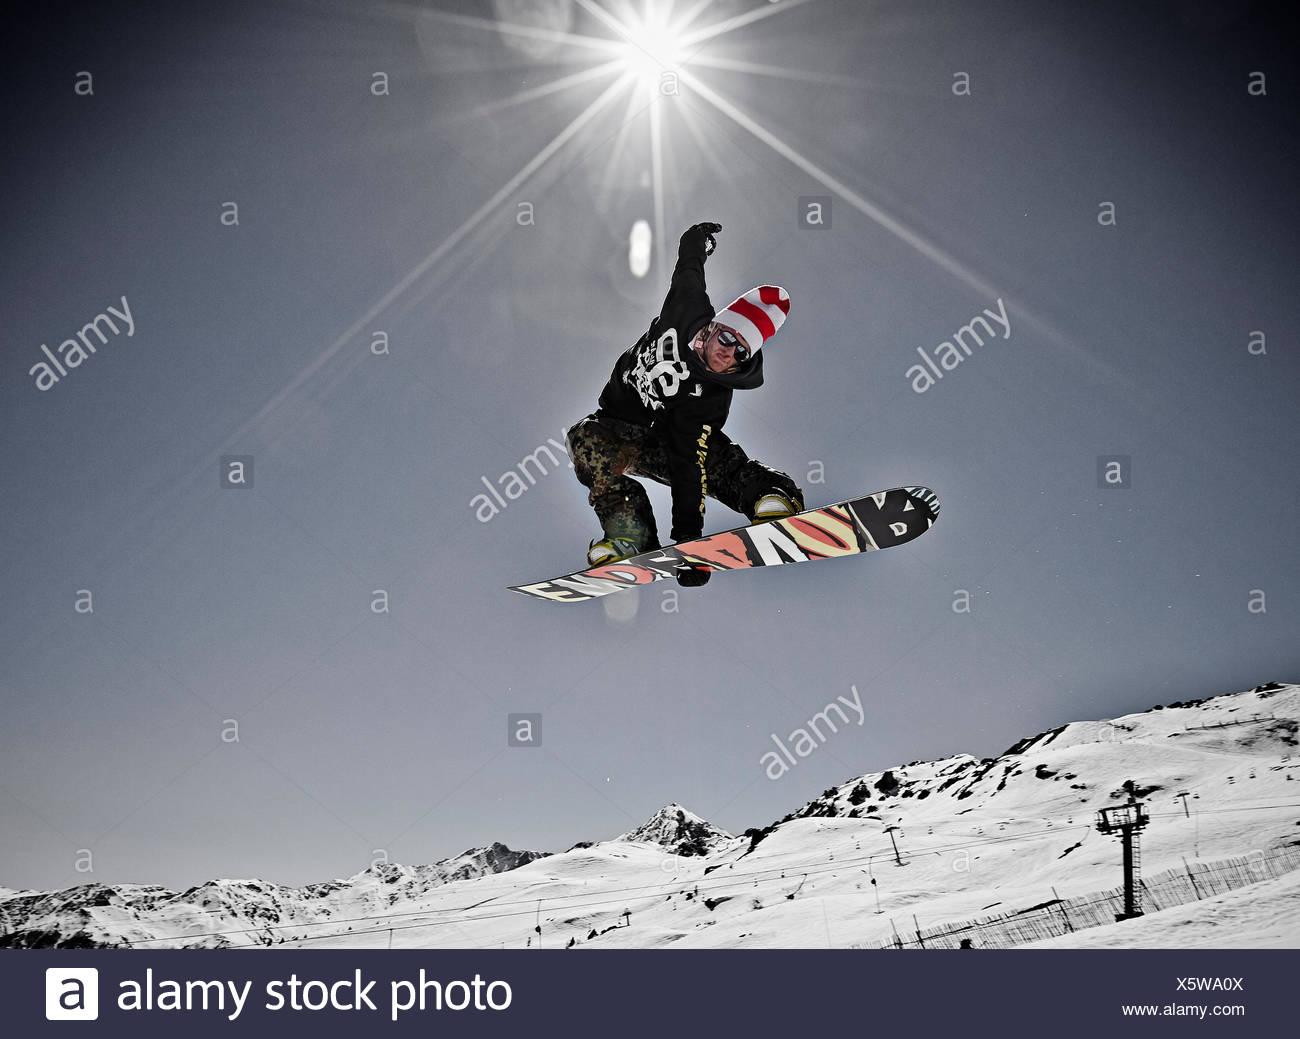 James Phillips Snowboarder Les Arcs - Stock Image